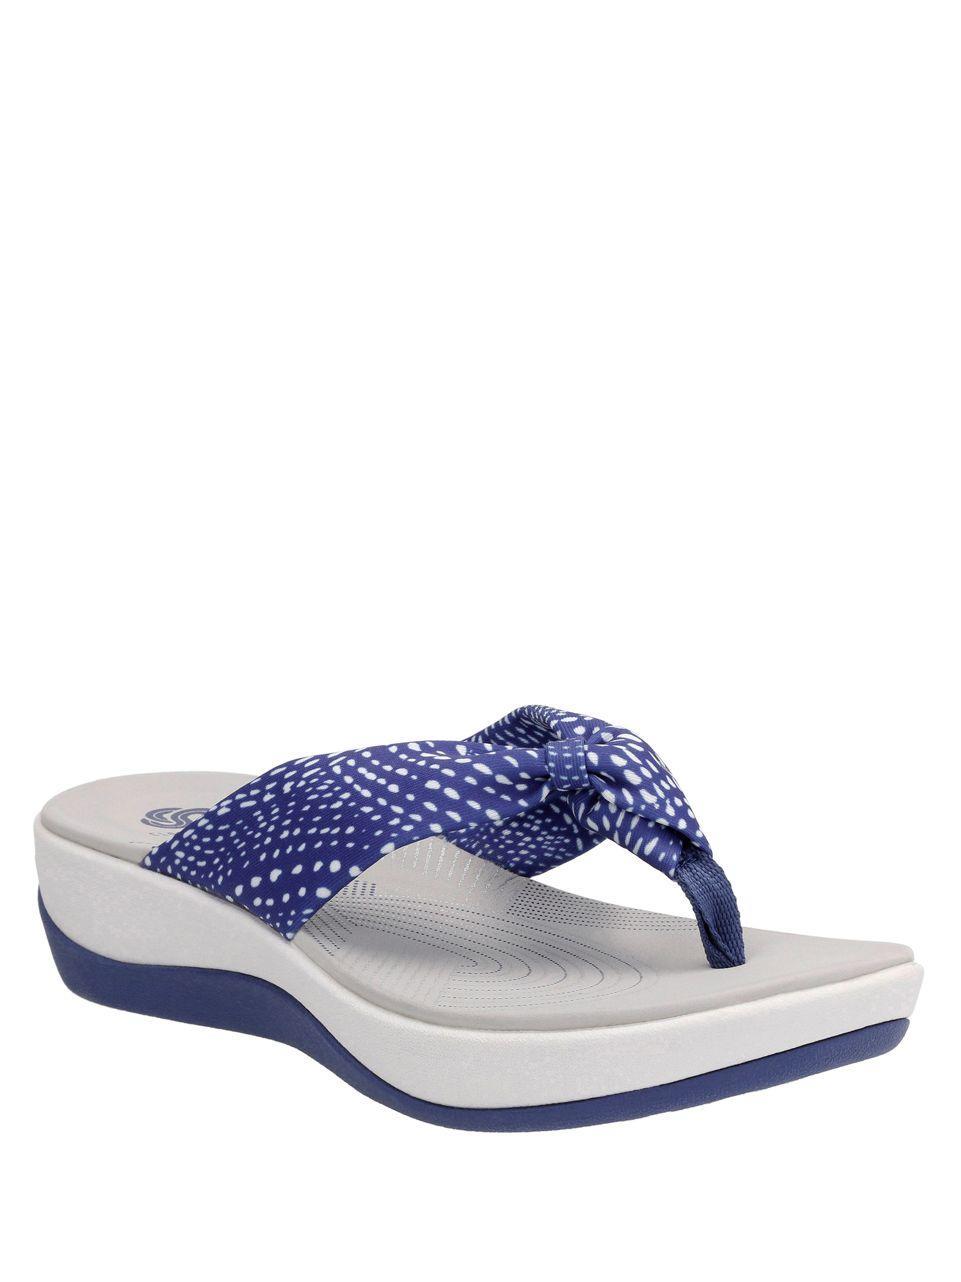 Clarks Arla Gilson Flip Flops In Blue - Save 51  Lyst-6641